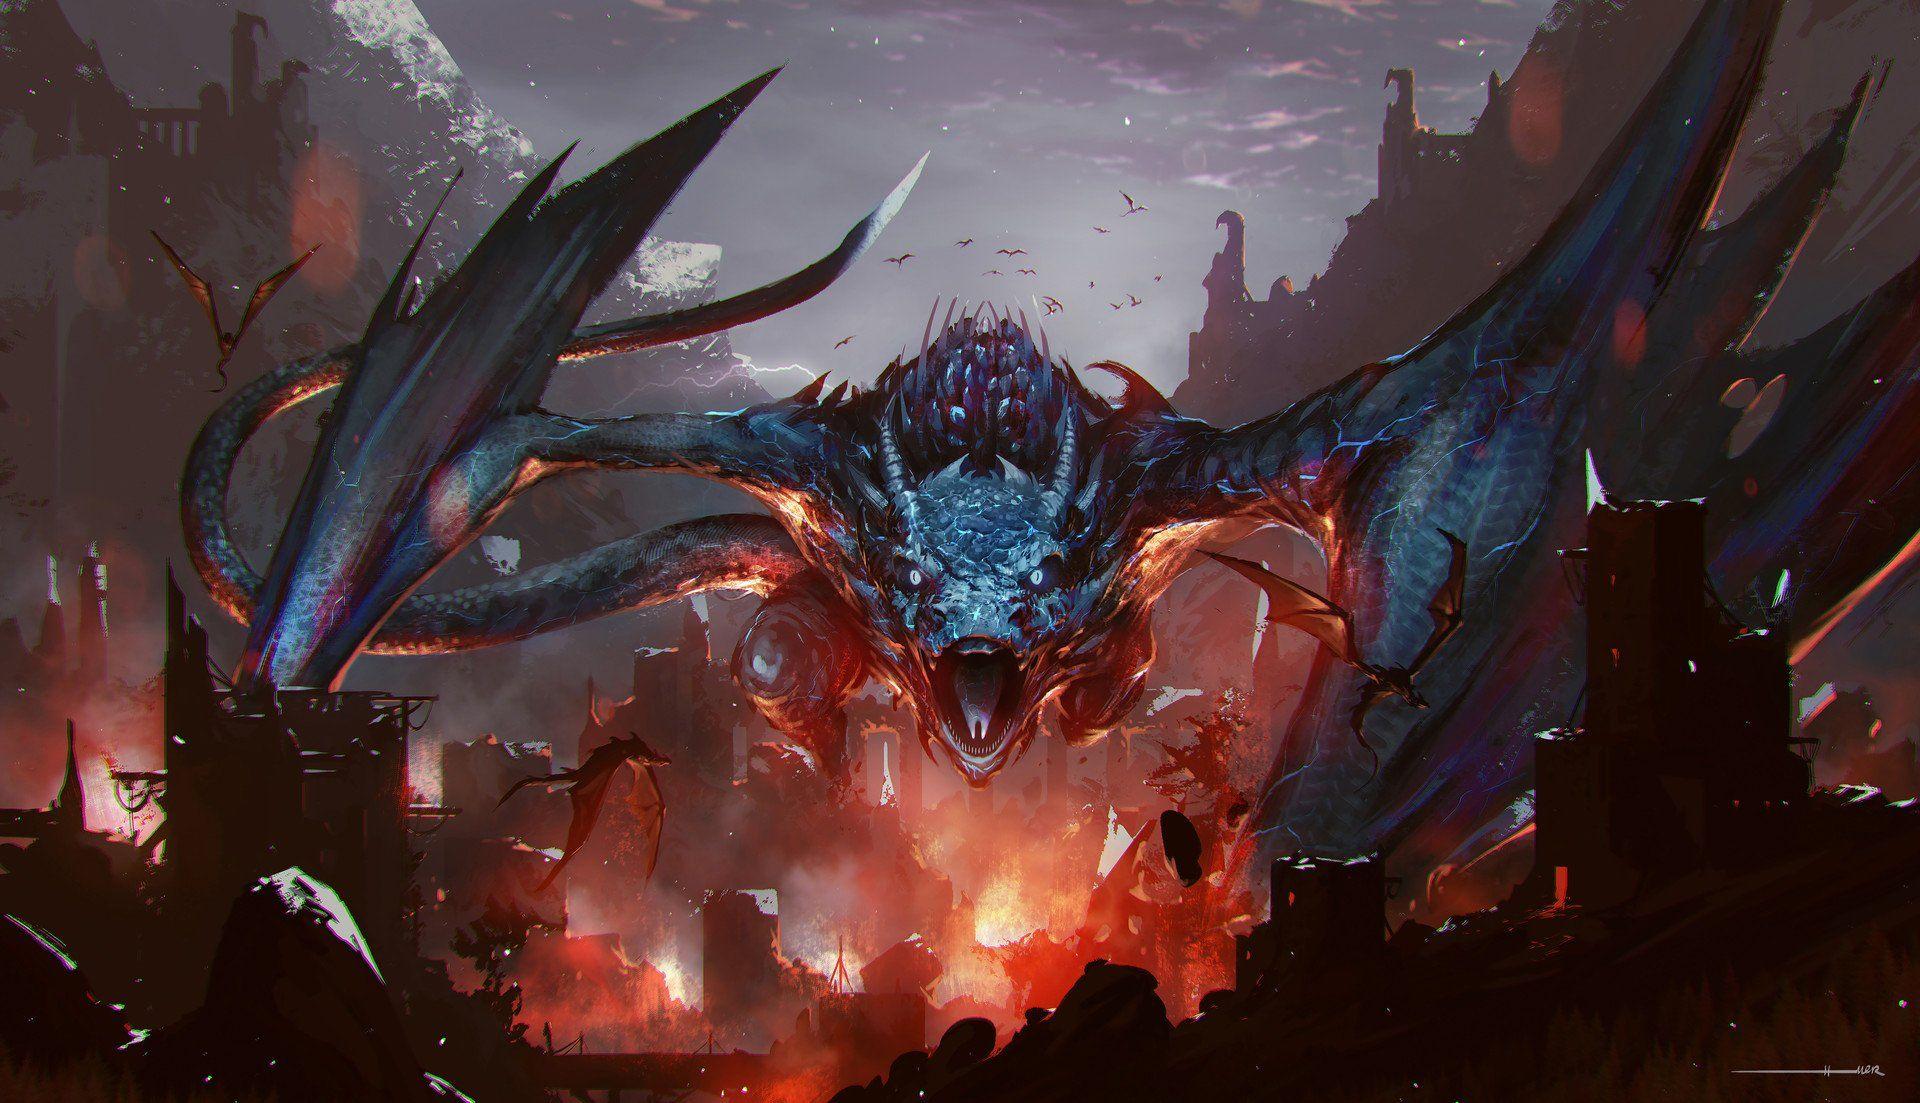 Fantasy Dragon City Ruin Fire Wallpaper Fantasy Artwork Shadow Of The Colossus Fantasy